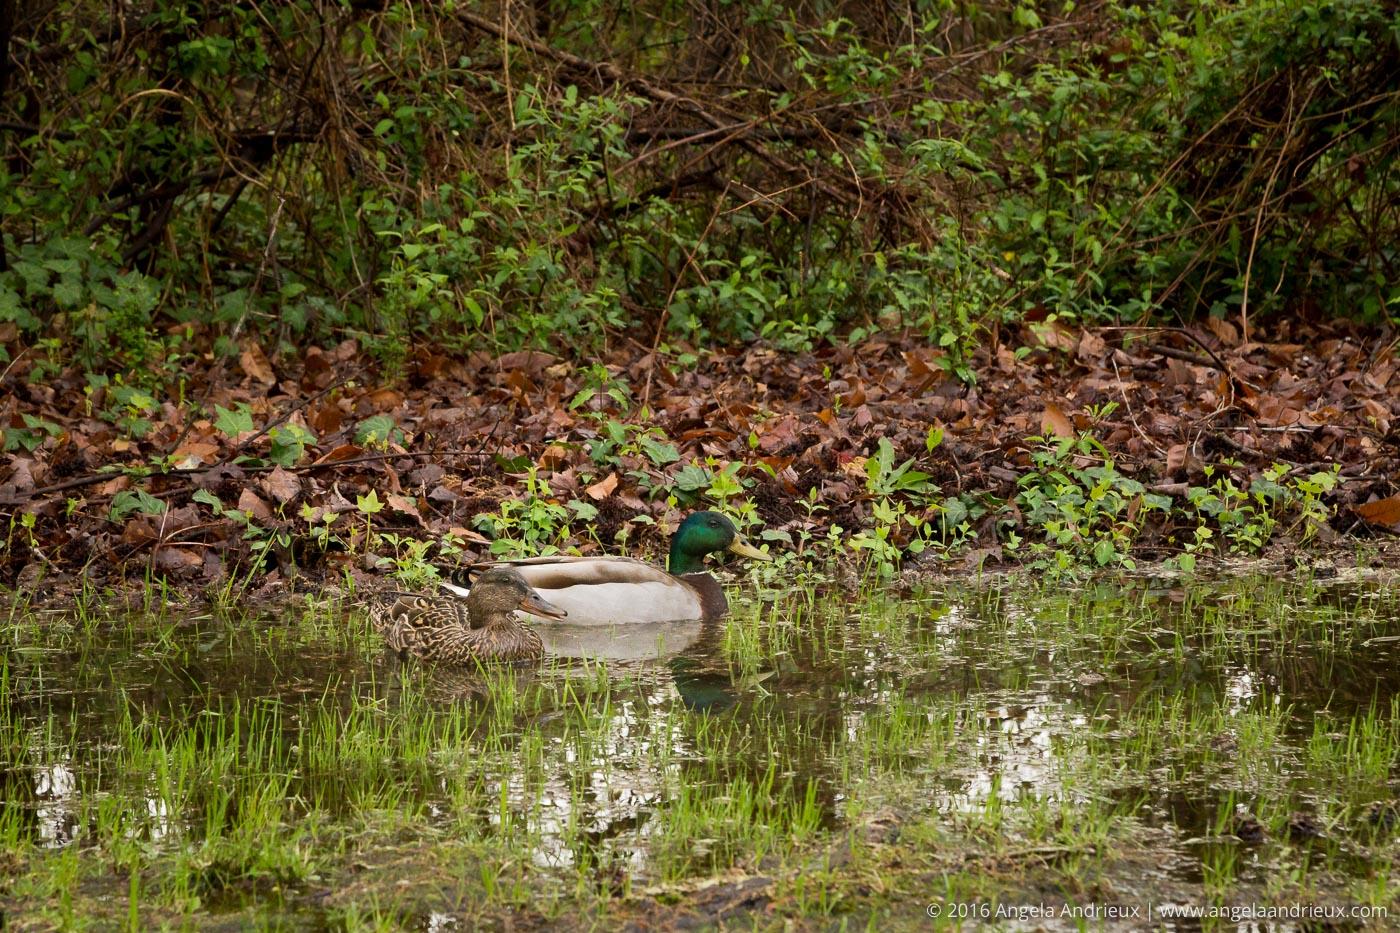 Ducks in a puddle | Chesapeake, VA